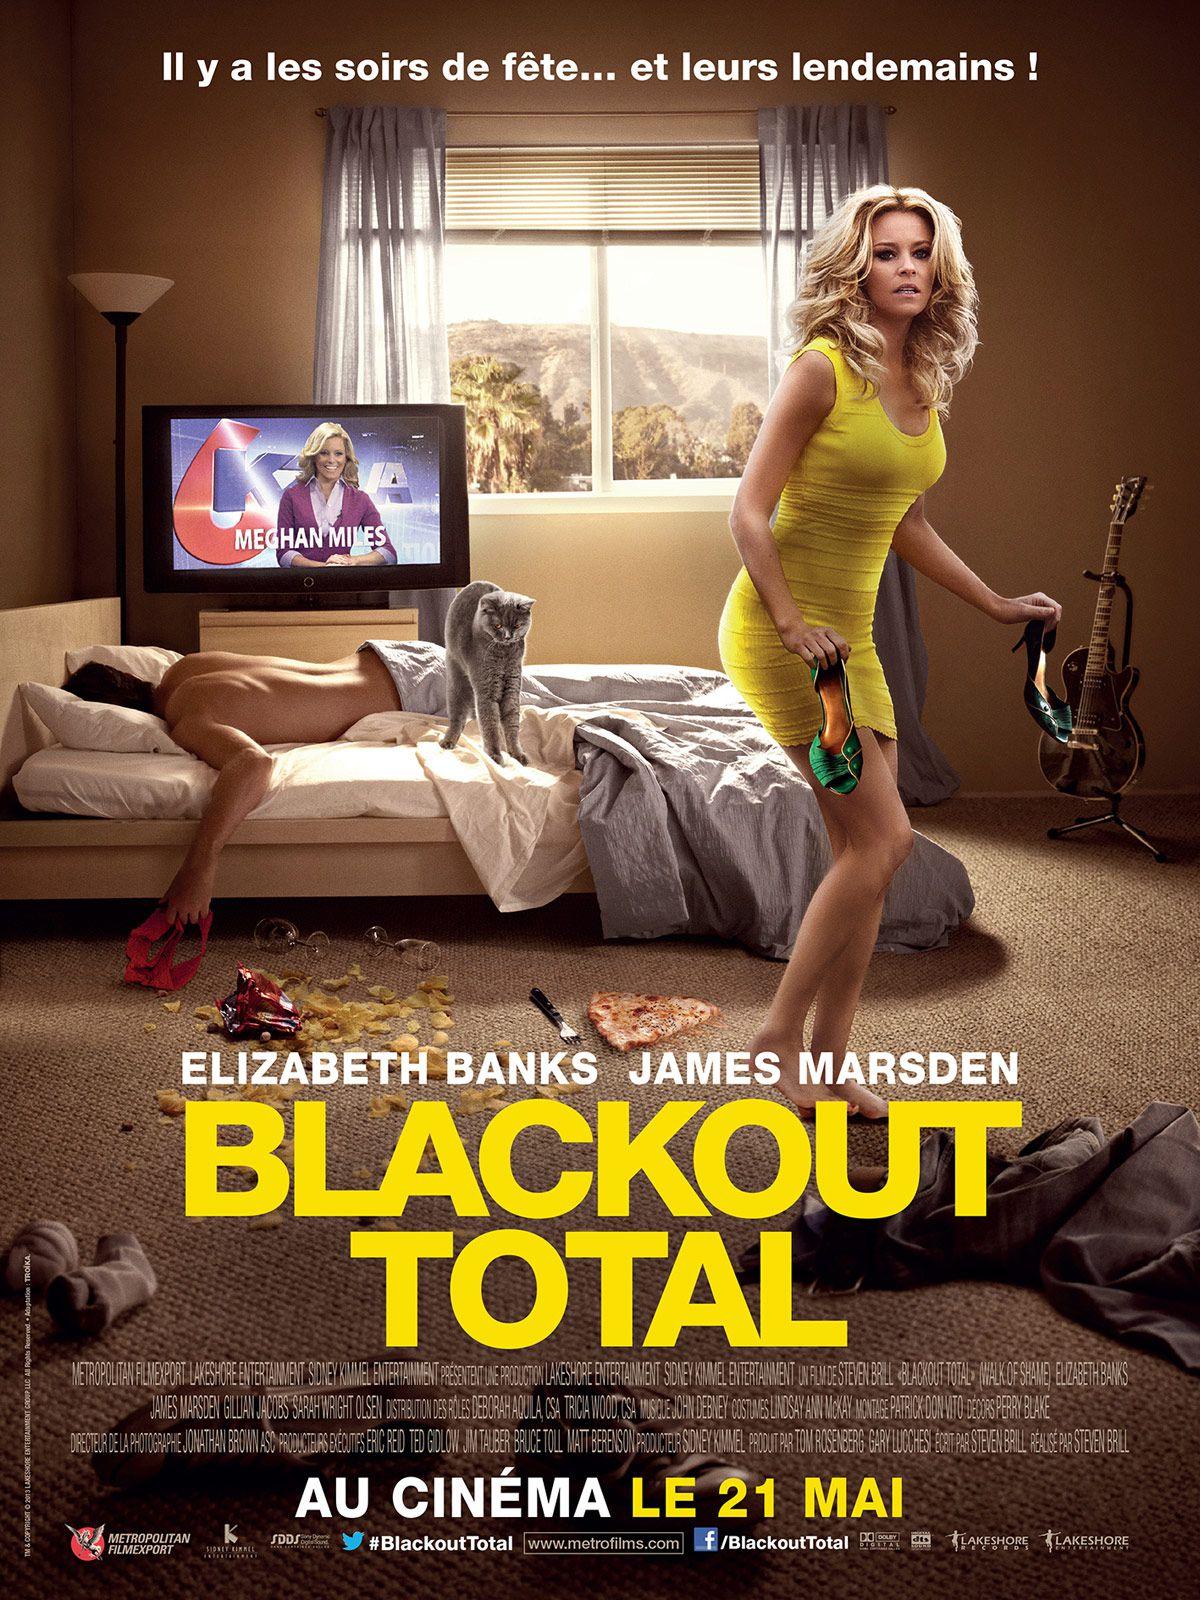 Blackout total - Film (2014)